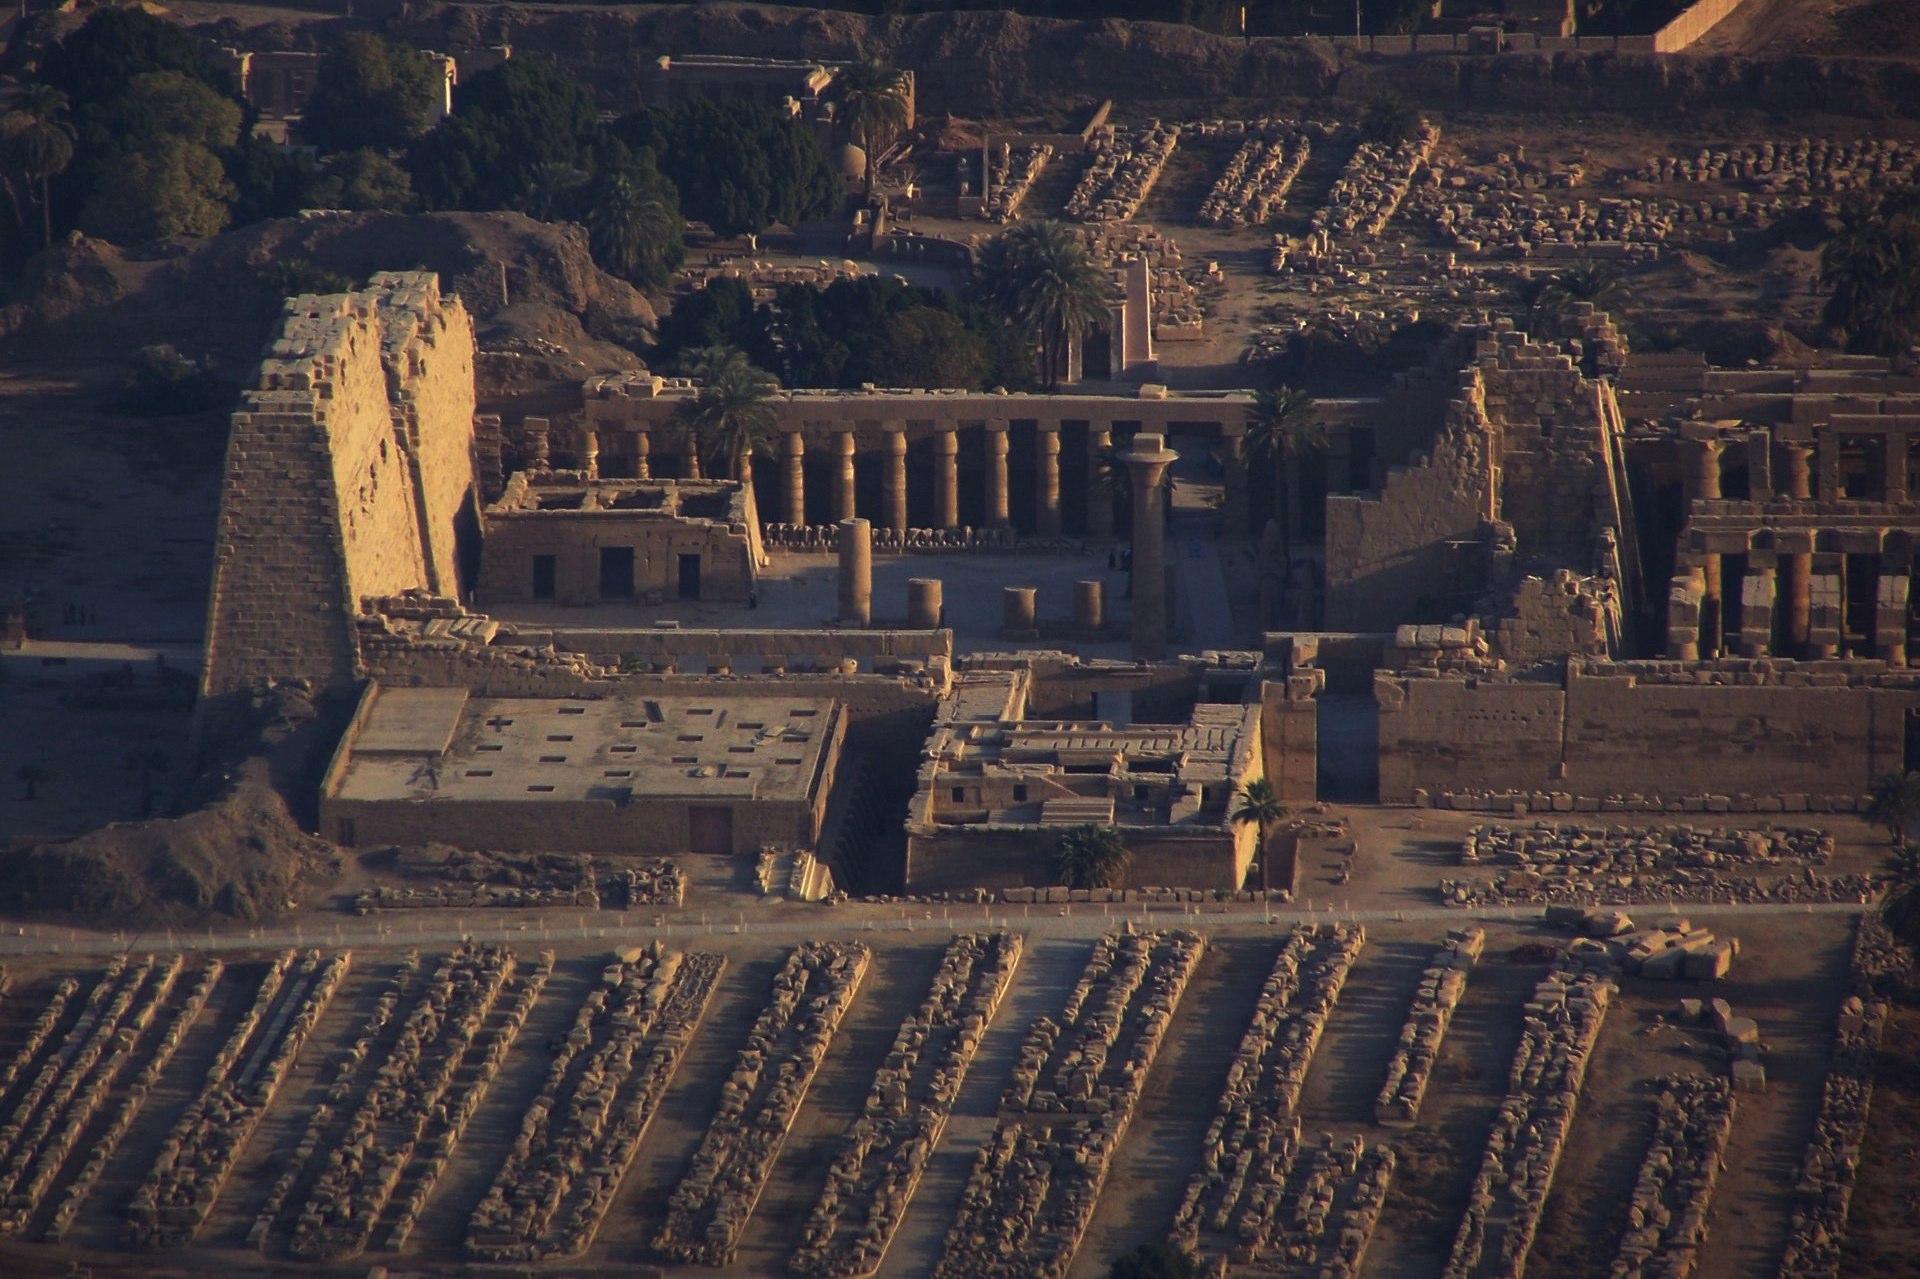 Tempel Ausgrabungen in Luxor